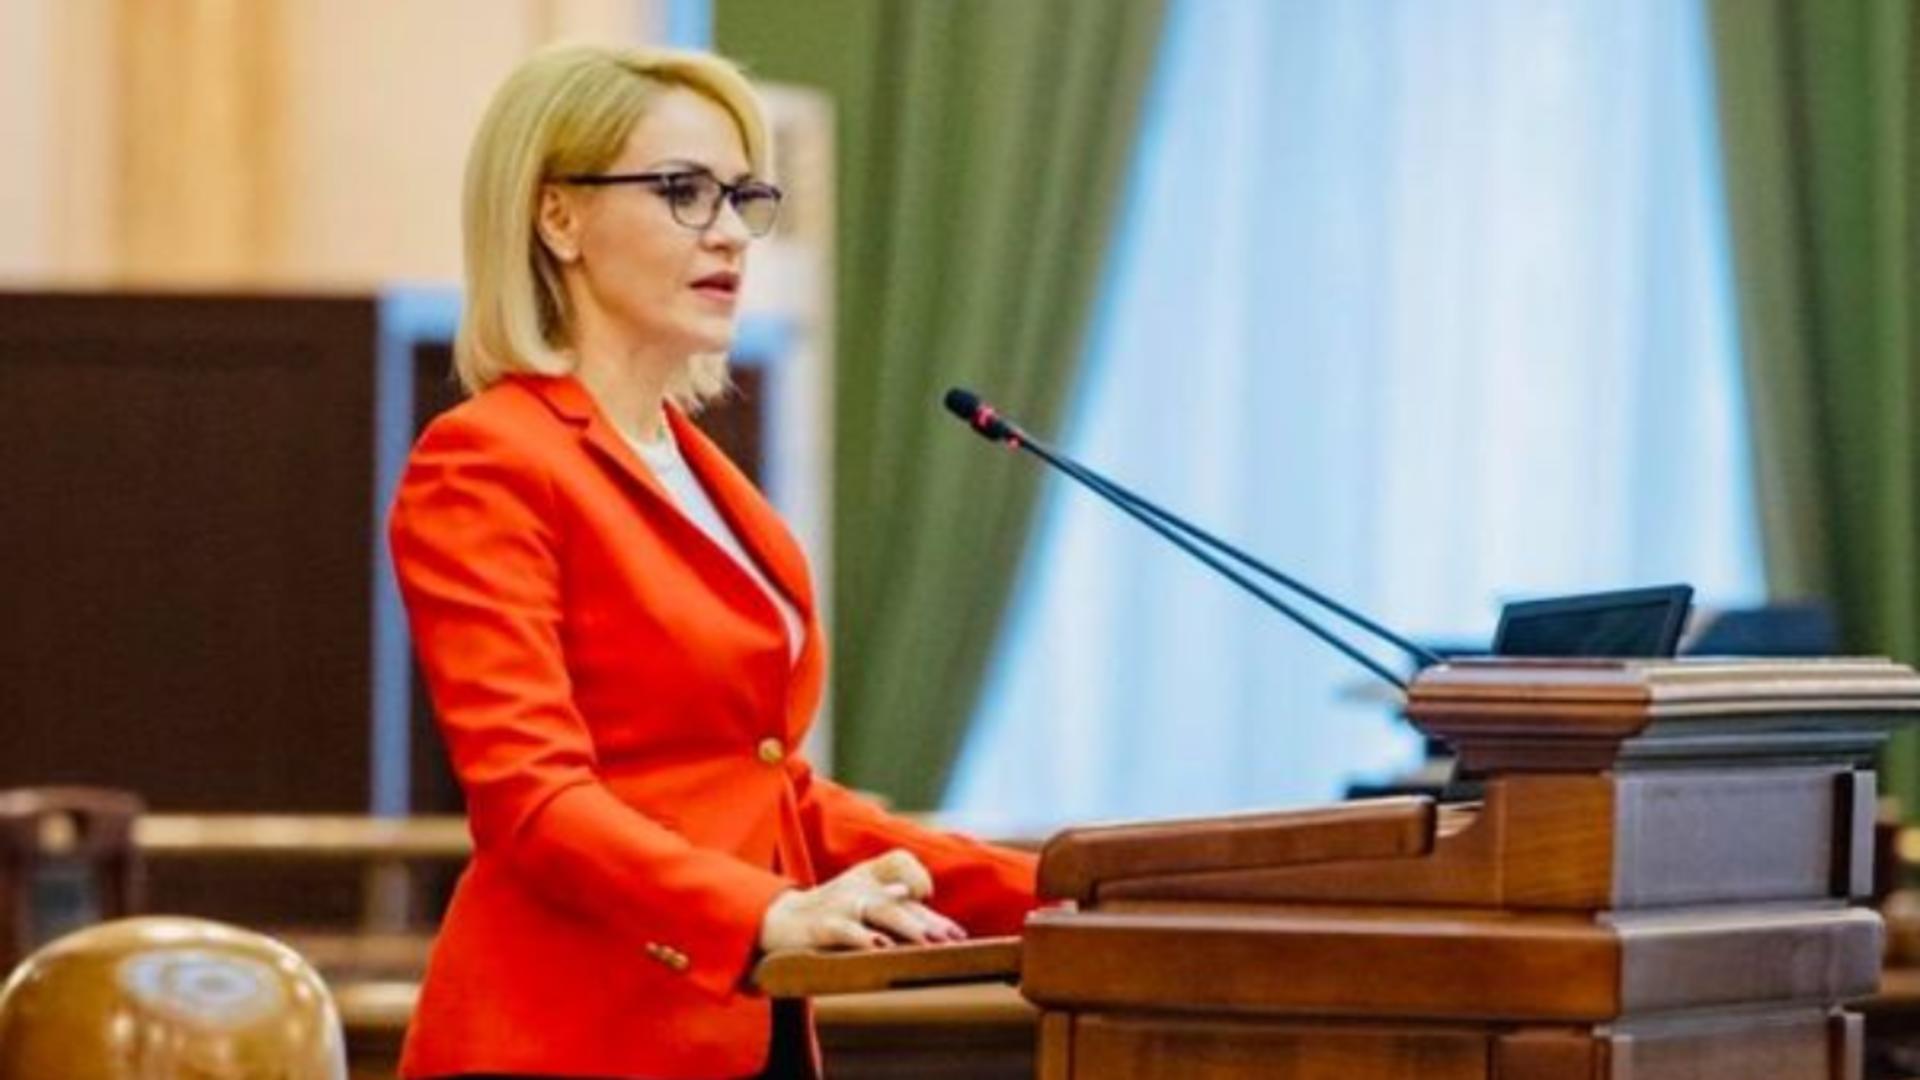 Gabriela Firea, senator PSD